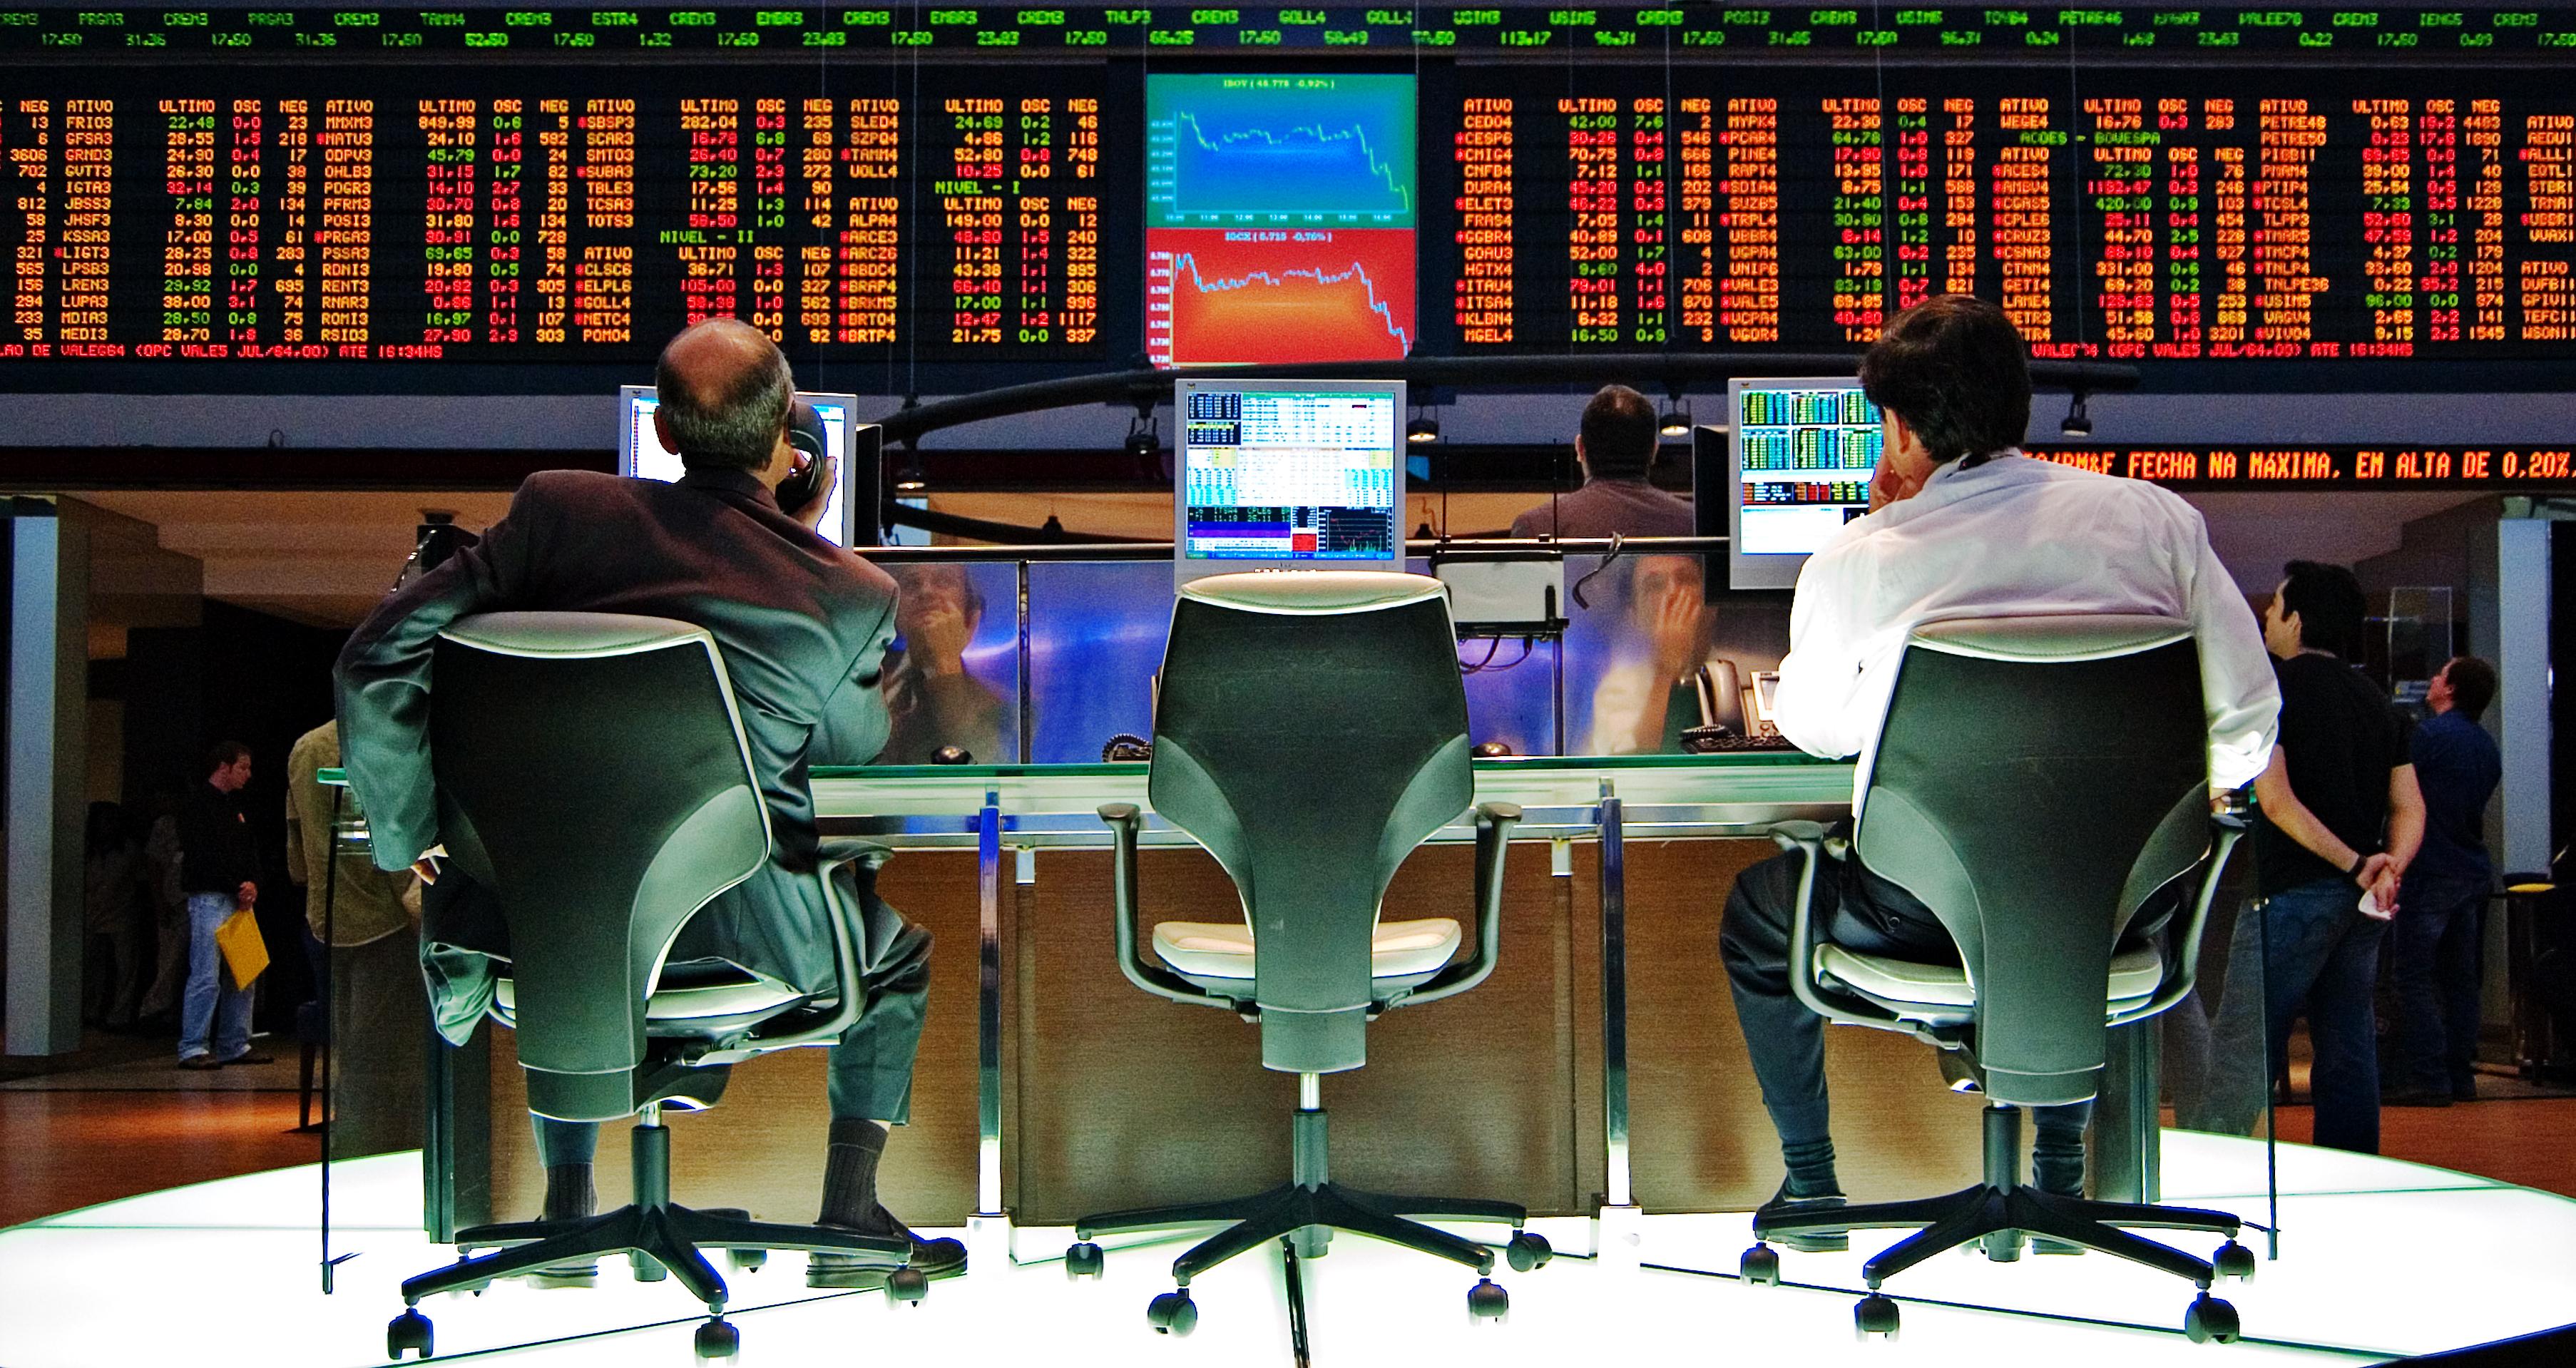 Stock Exchange. Photo: Flickr, Rafael Matsunaga